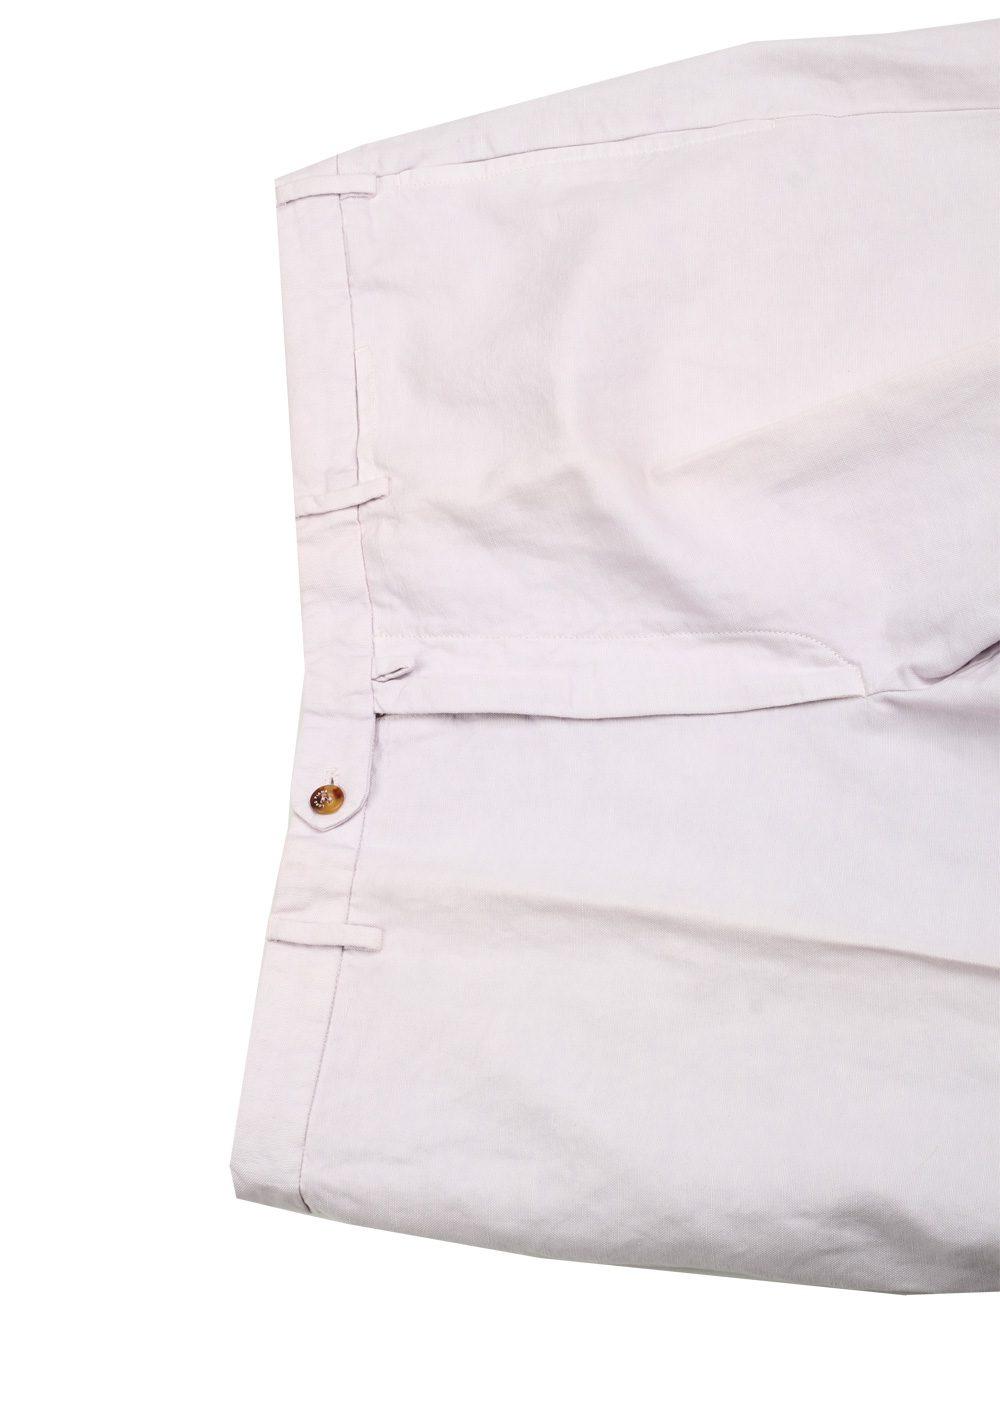 Loro Piana Pink Trousers Size 58 / 42 U.S. | Costume Limité